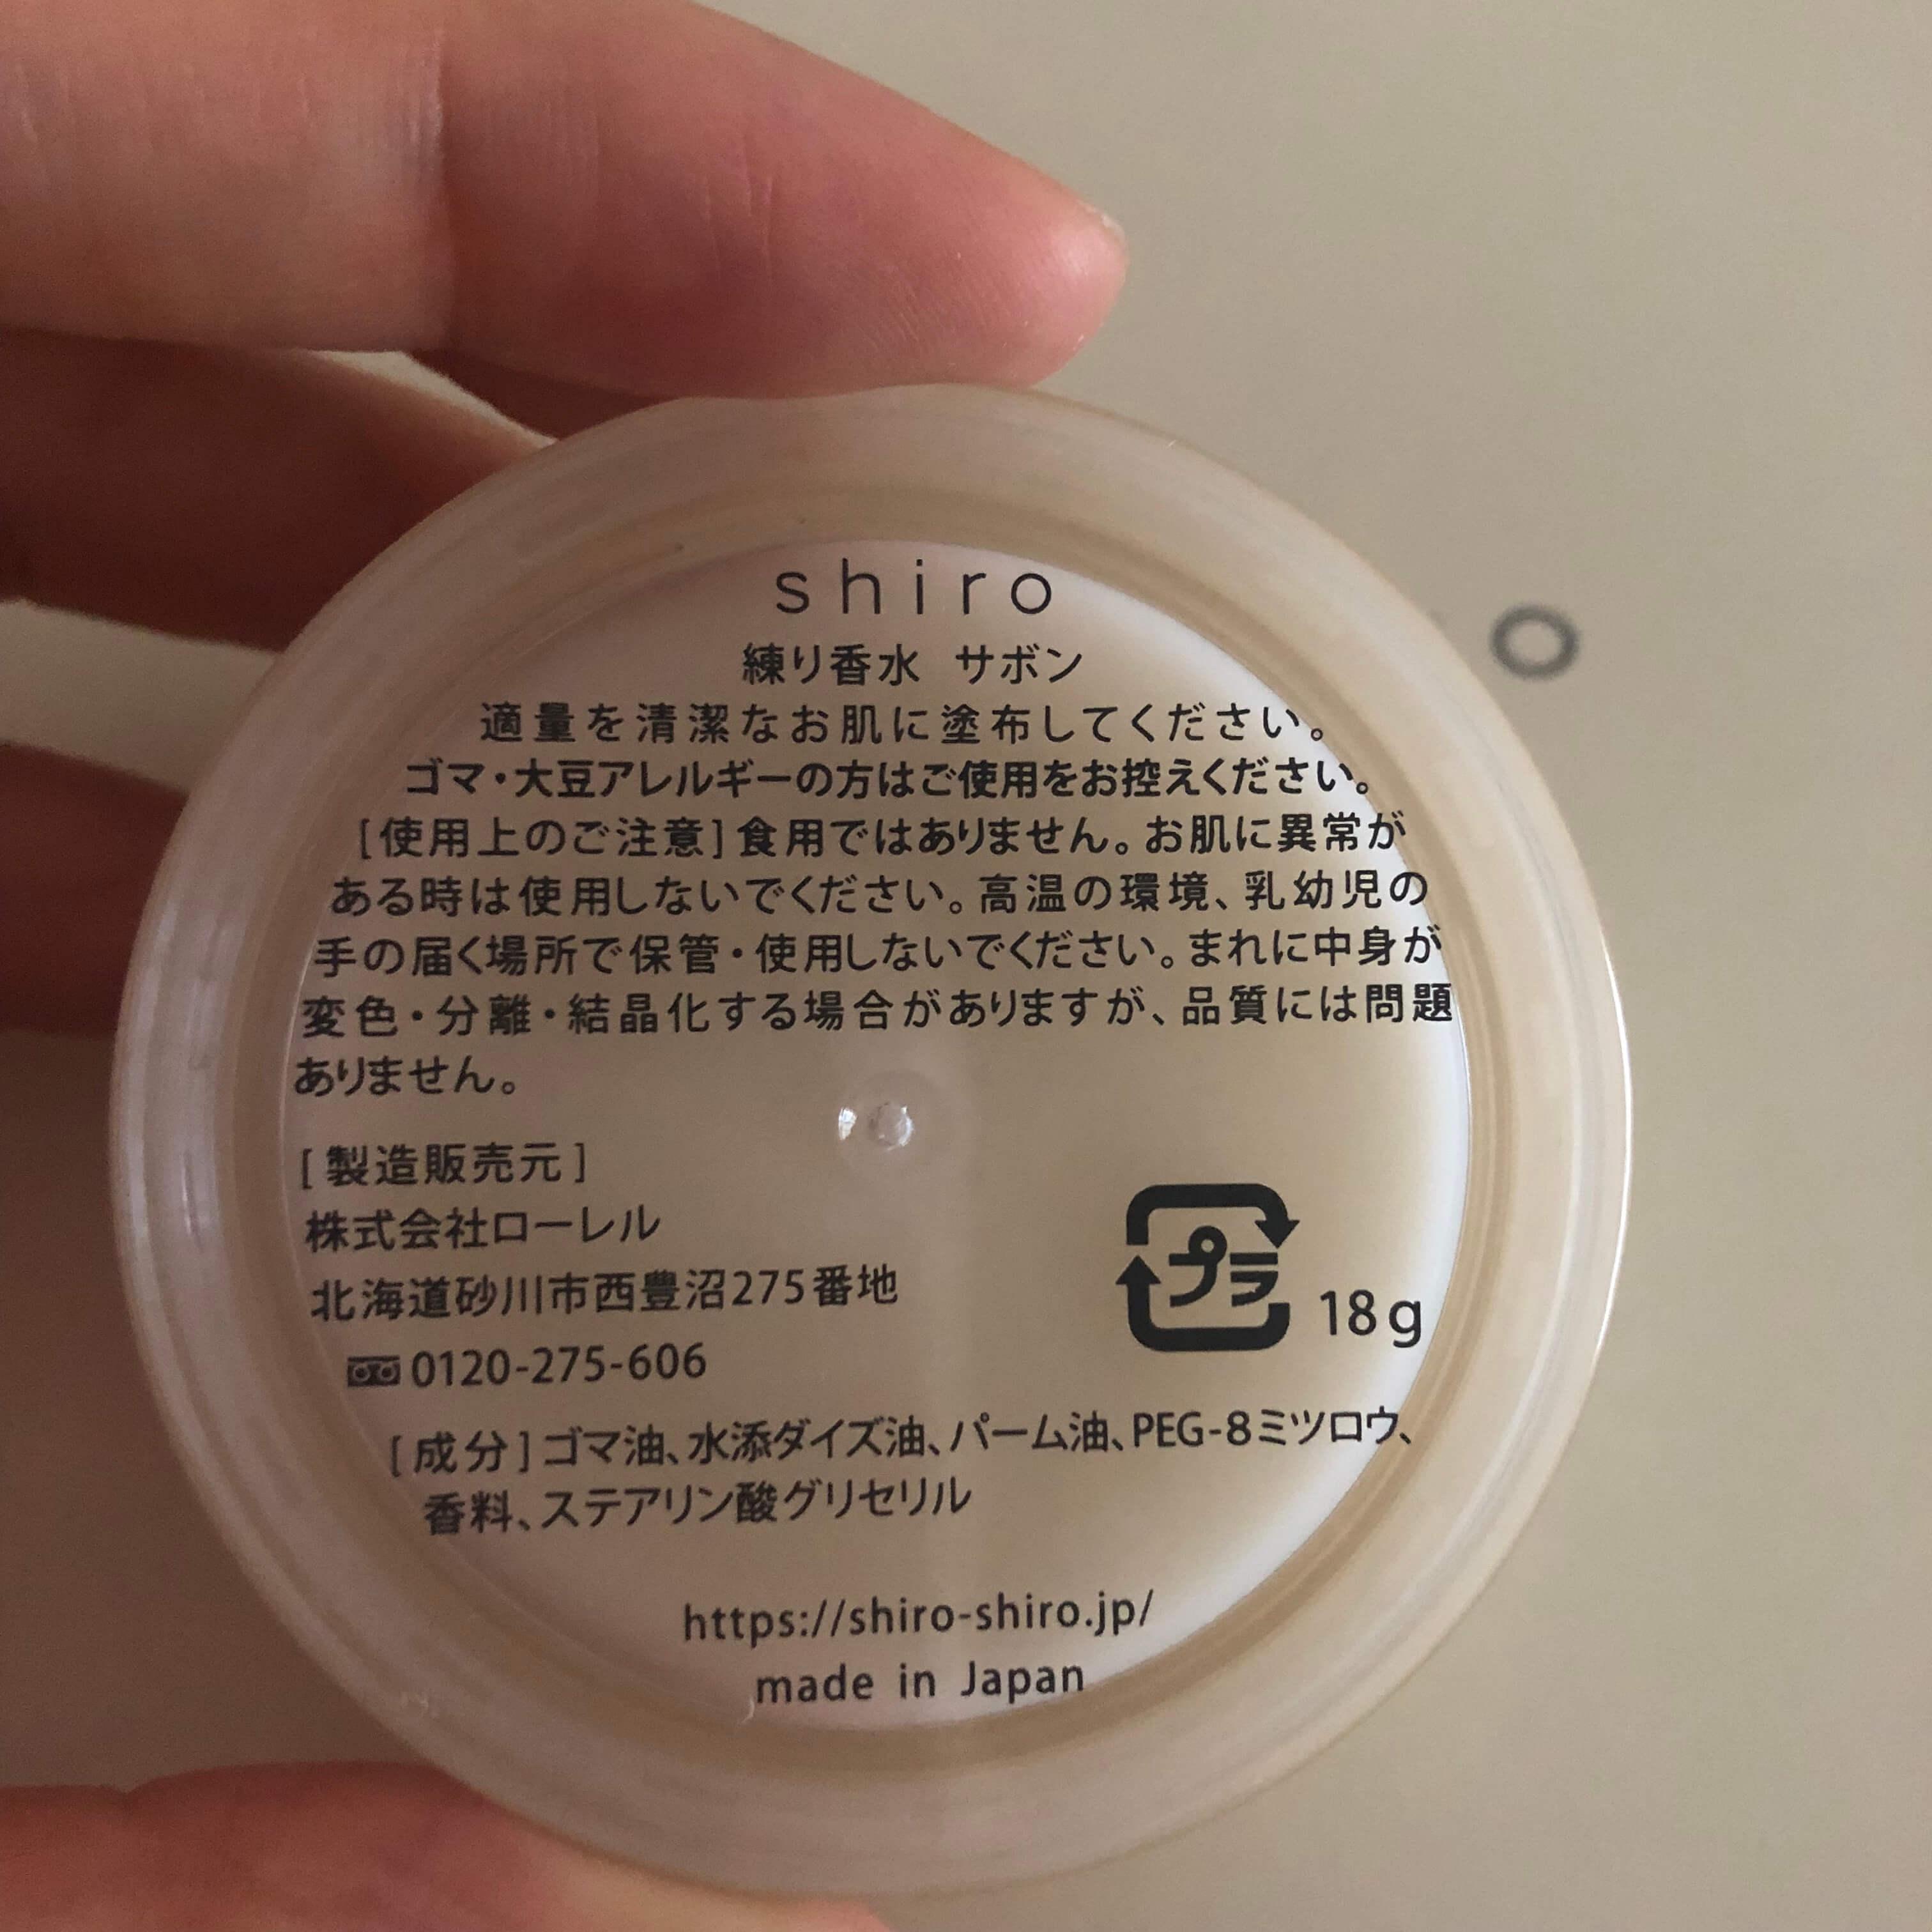 [shiro]清楚さは香りから[練り香水]_1_1-4